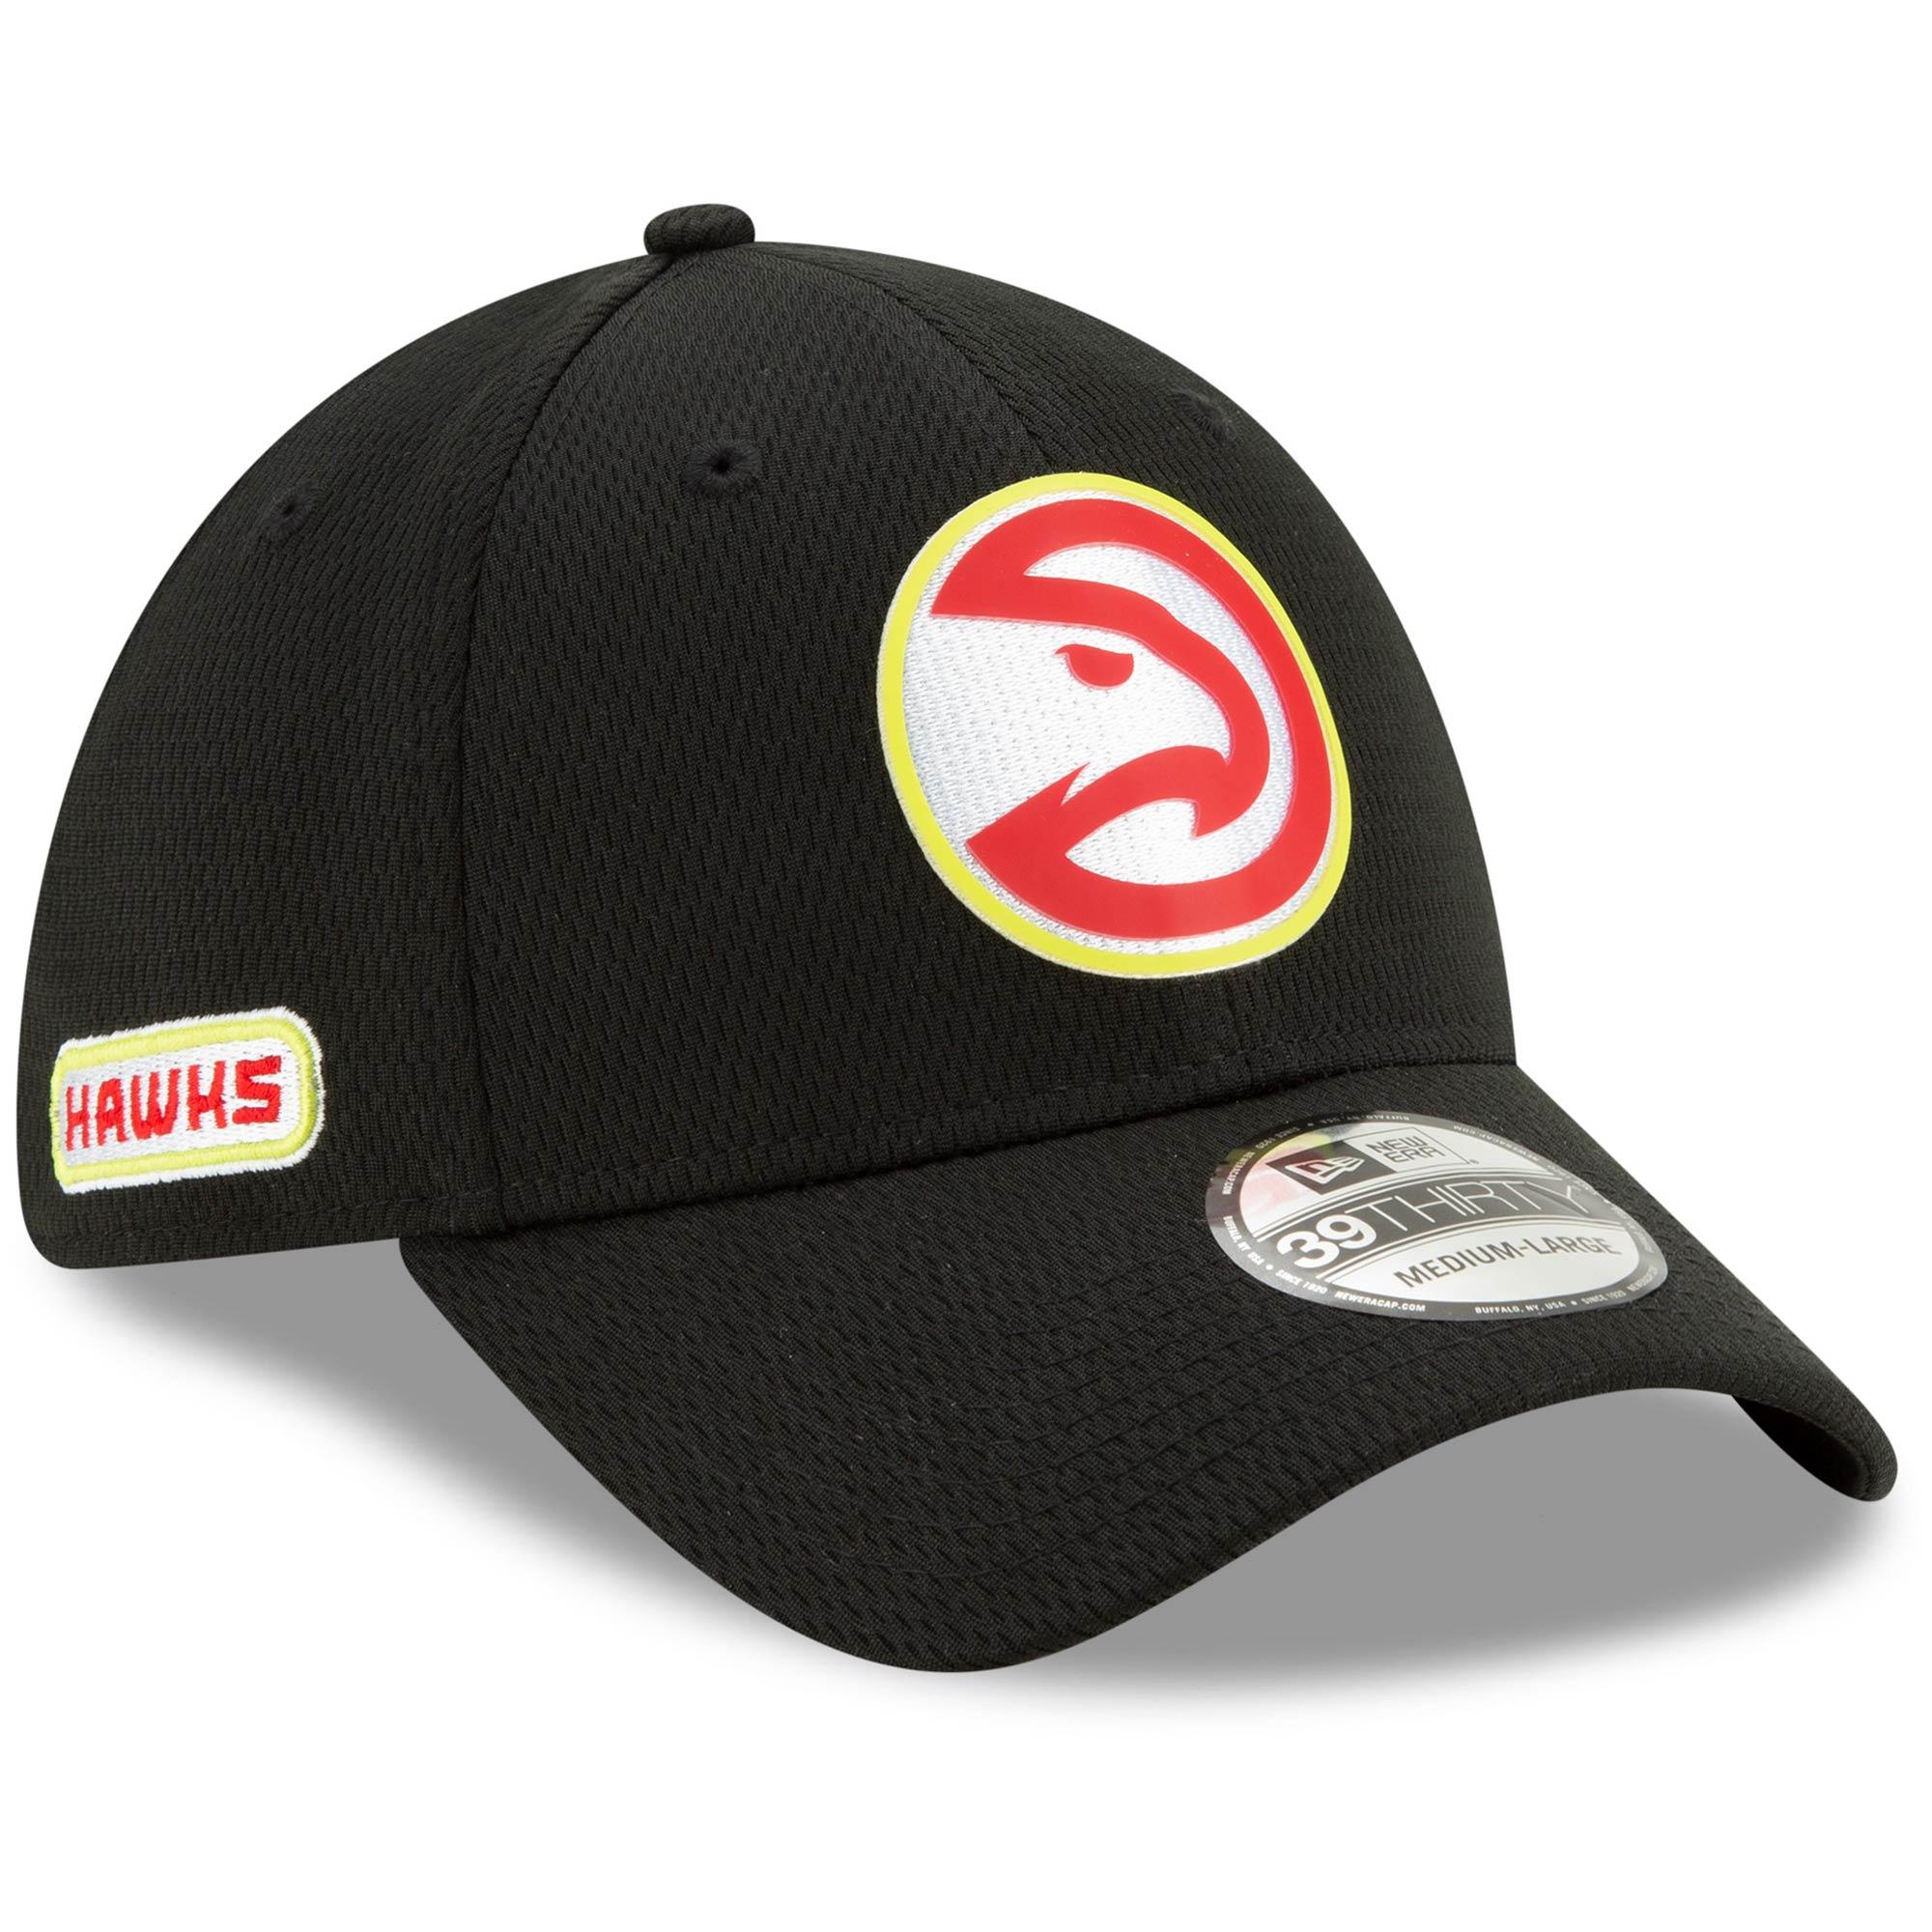 Atlanta Hawks New Era Official Back Half 39THIRTY Flex Hat - Black